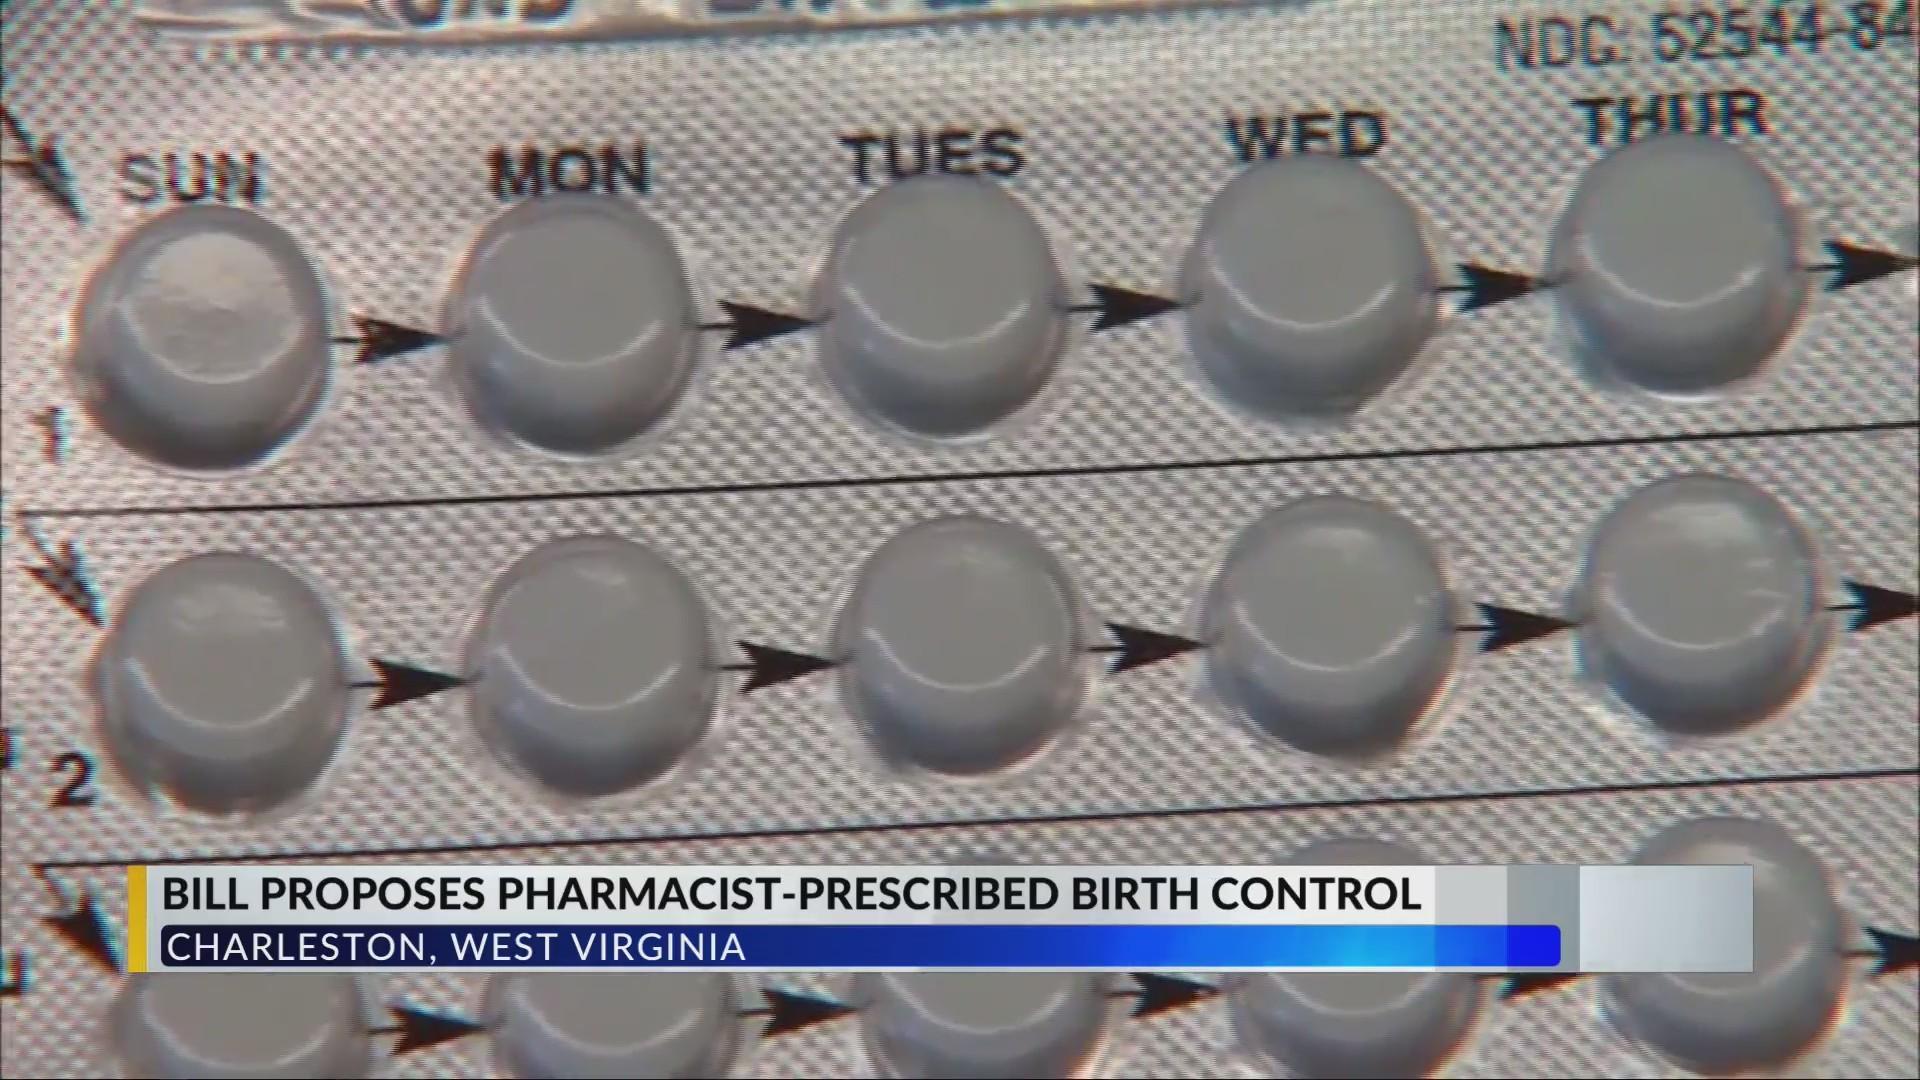 Bill Proposes Pharmacist-Prescribed Birth Control